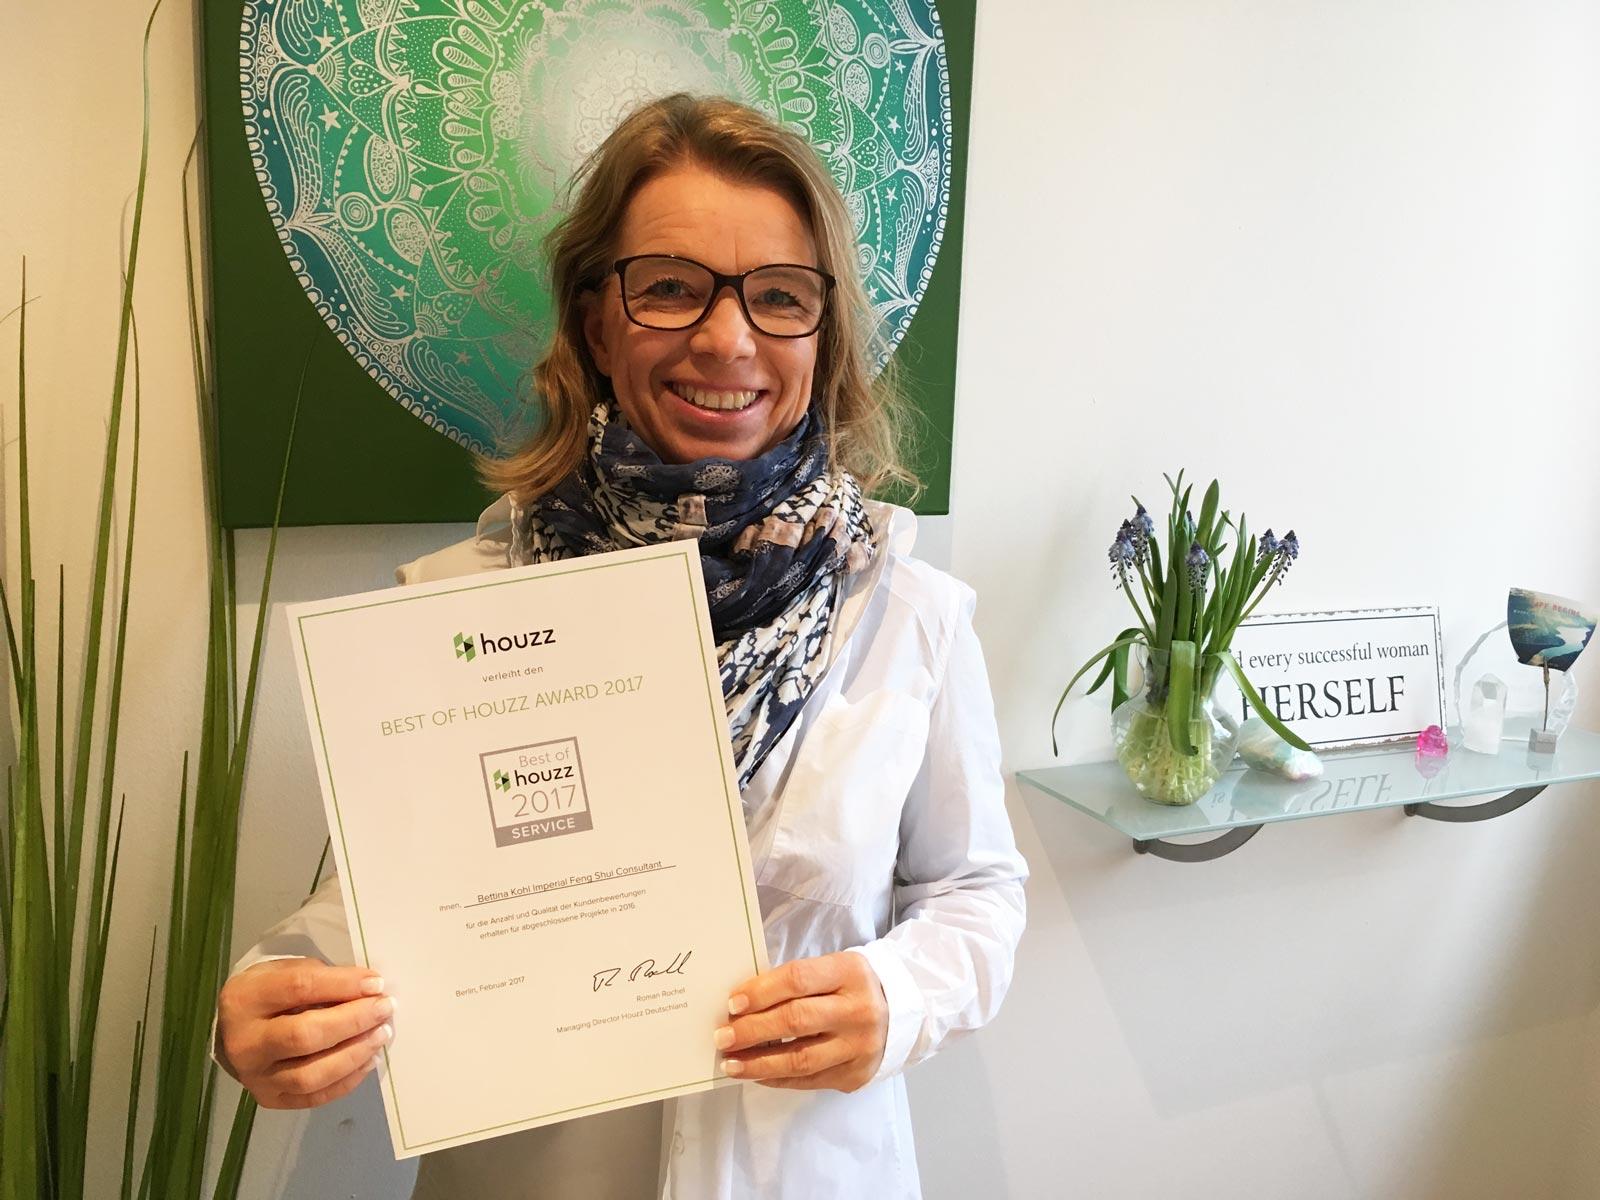 Bettina Kohl Houzz Award 2017